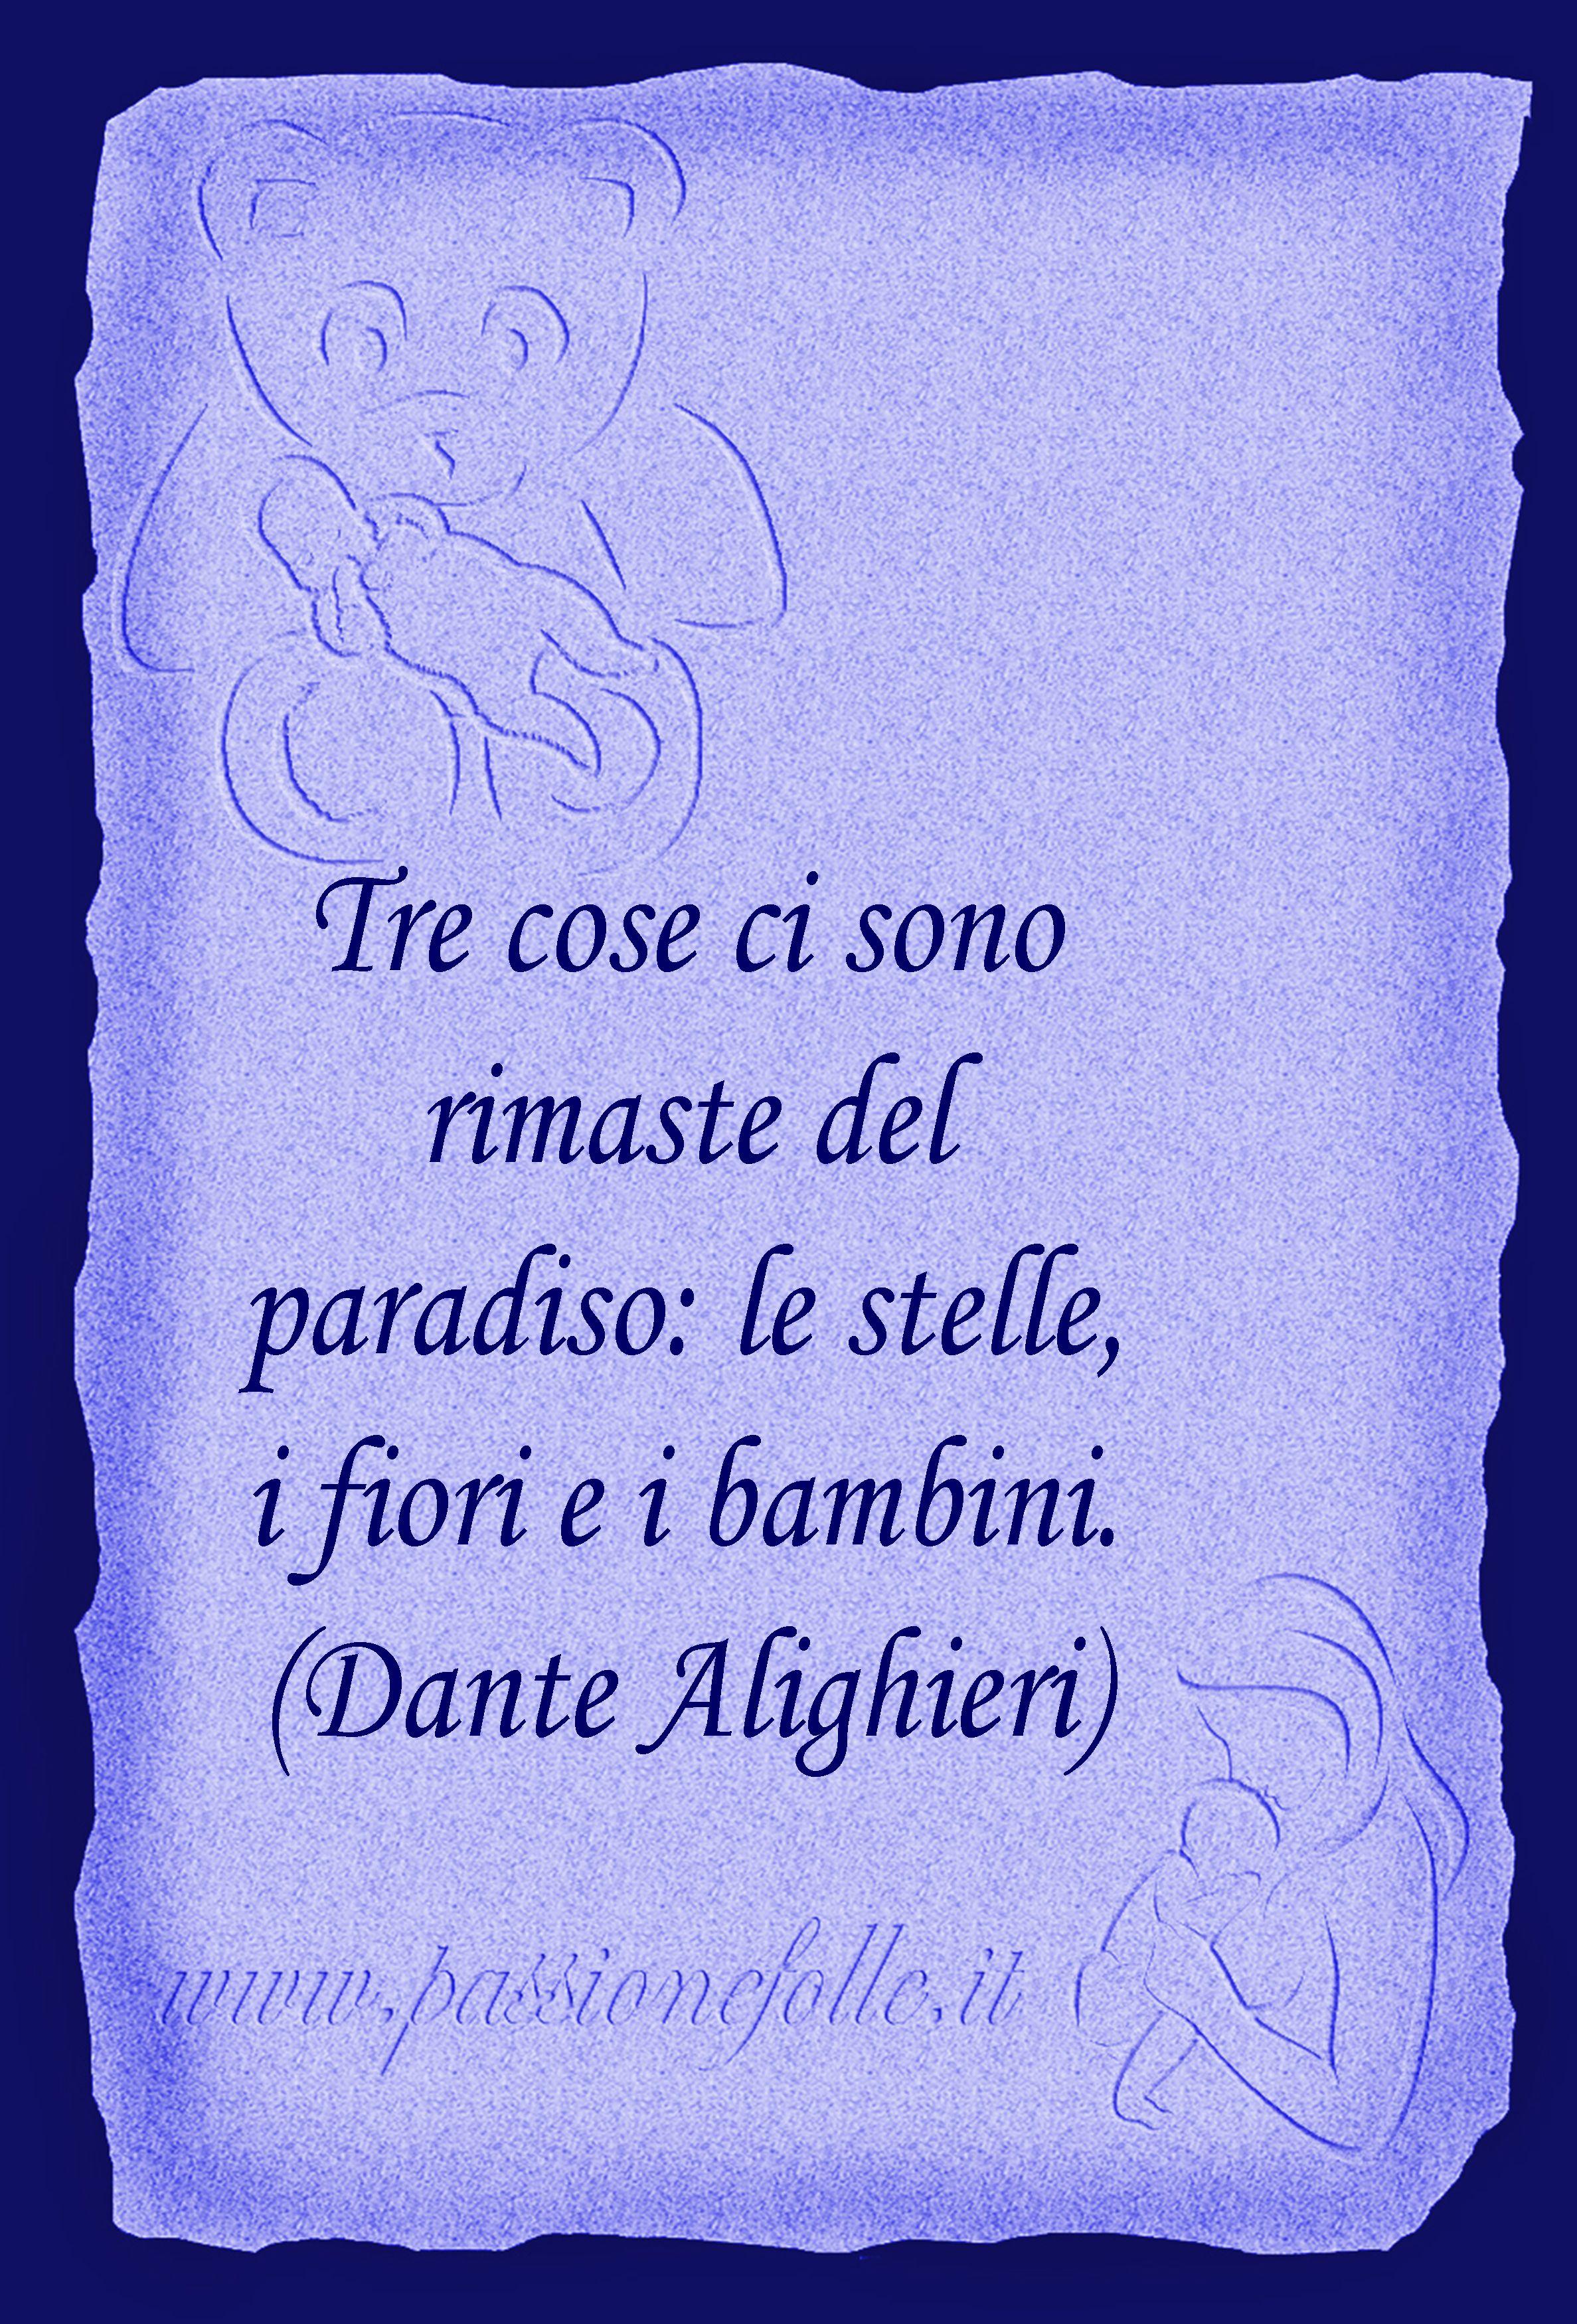 Frasi Celebri Di Dante.Dante Alighieri Passione Folle Modi Di Dire Italiani Citazioni Motivazionali Dante Alighieri